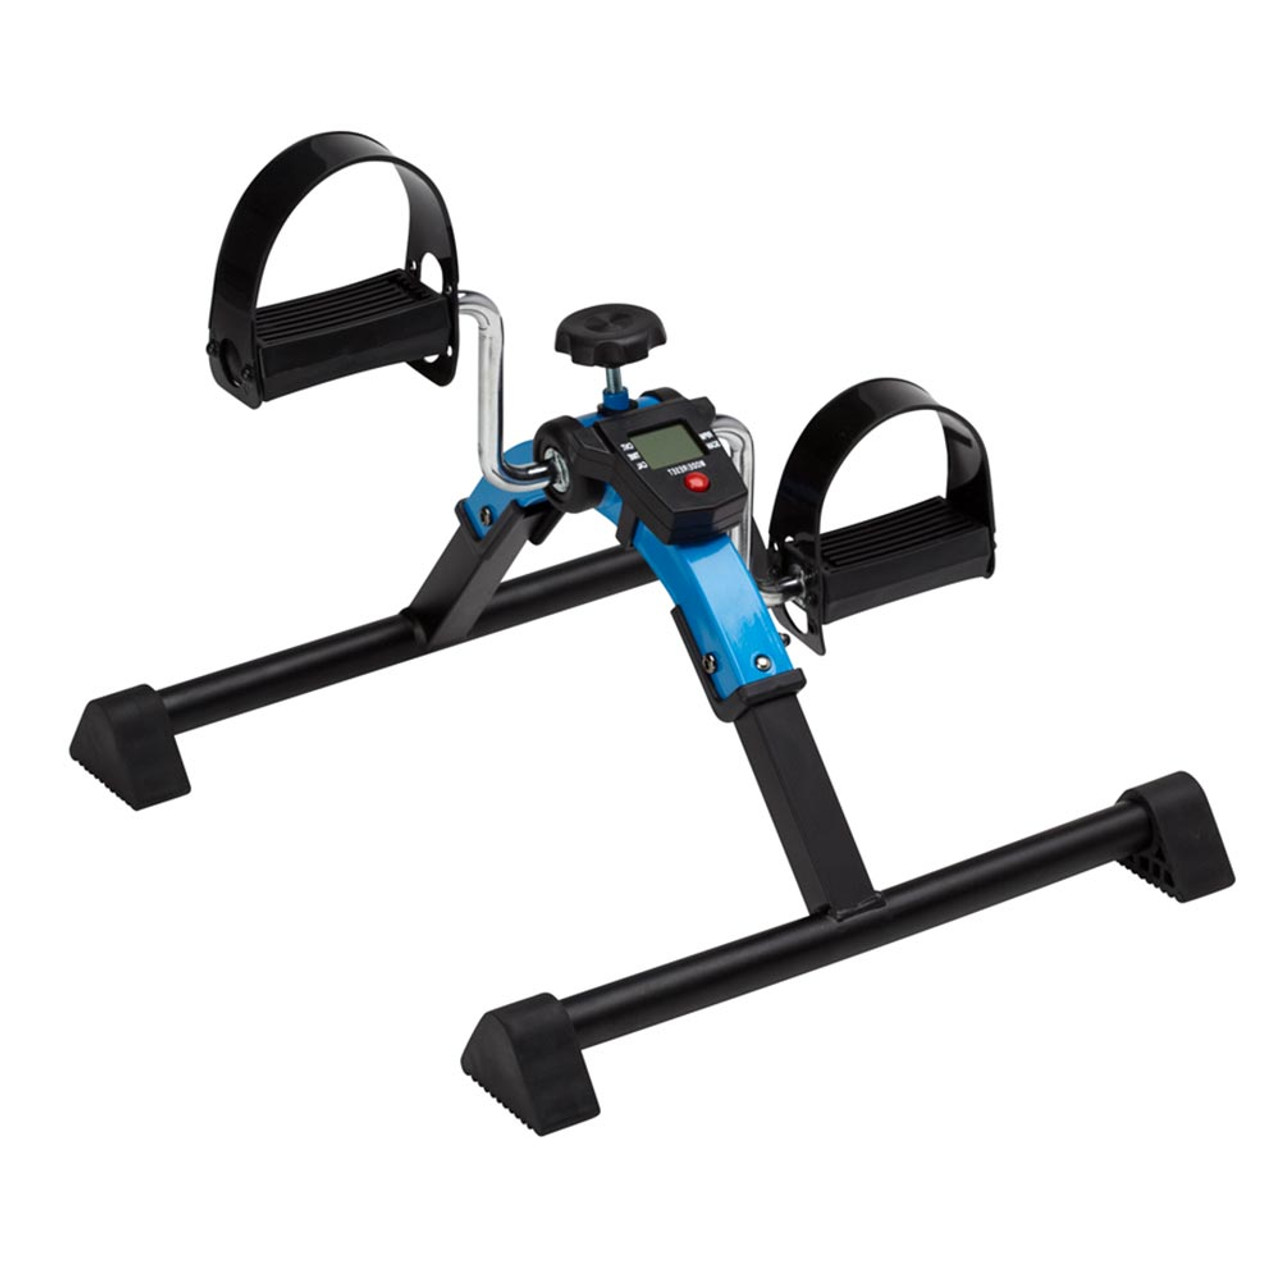 Folding Digital Pedal Exerciser DADPE1 Blue